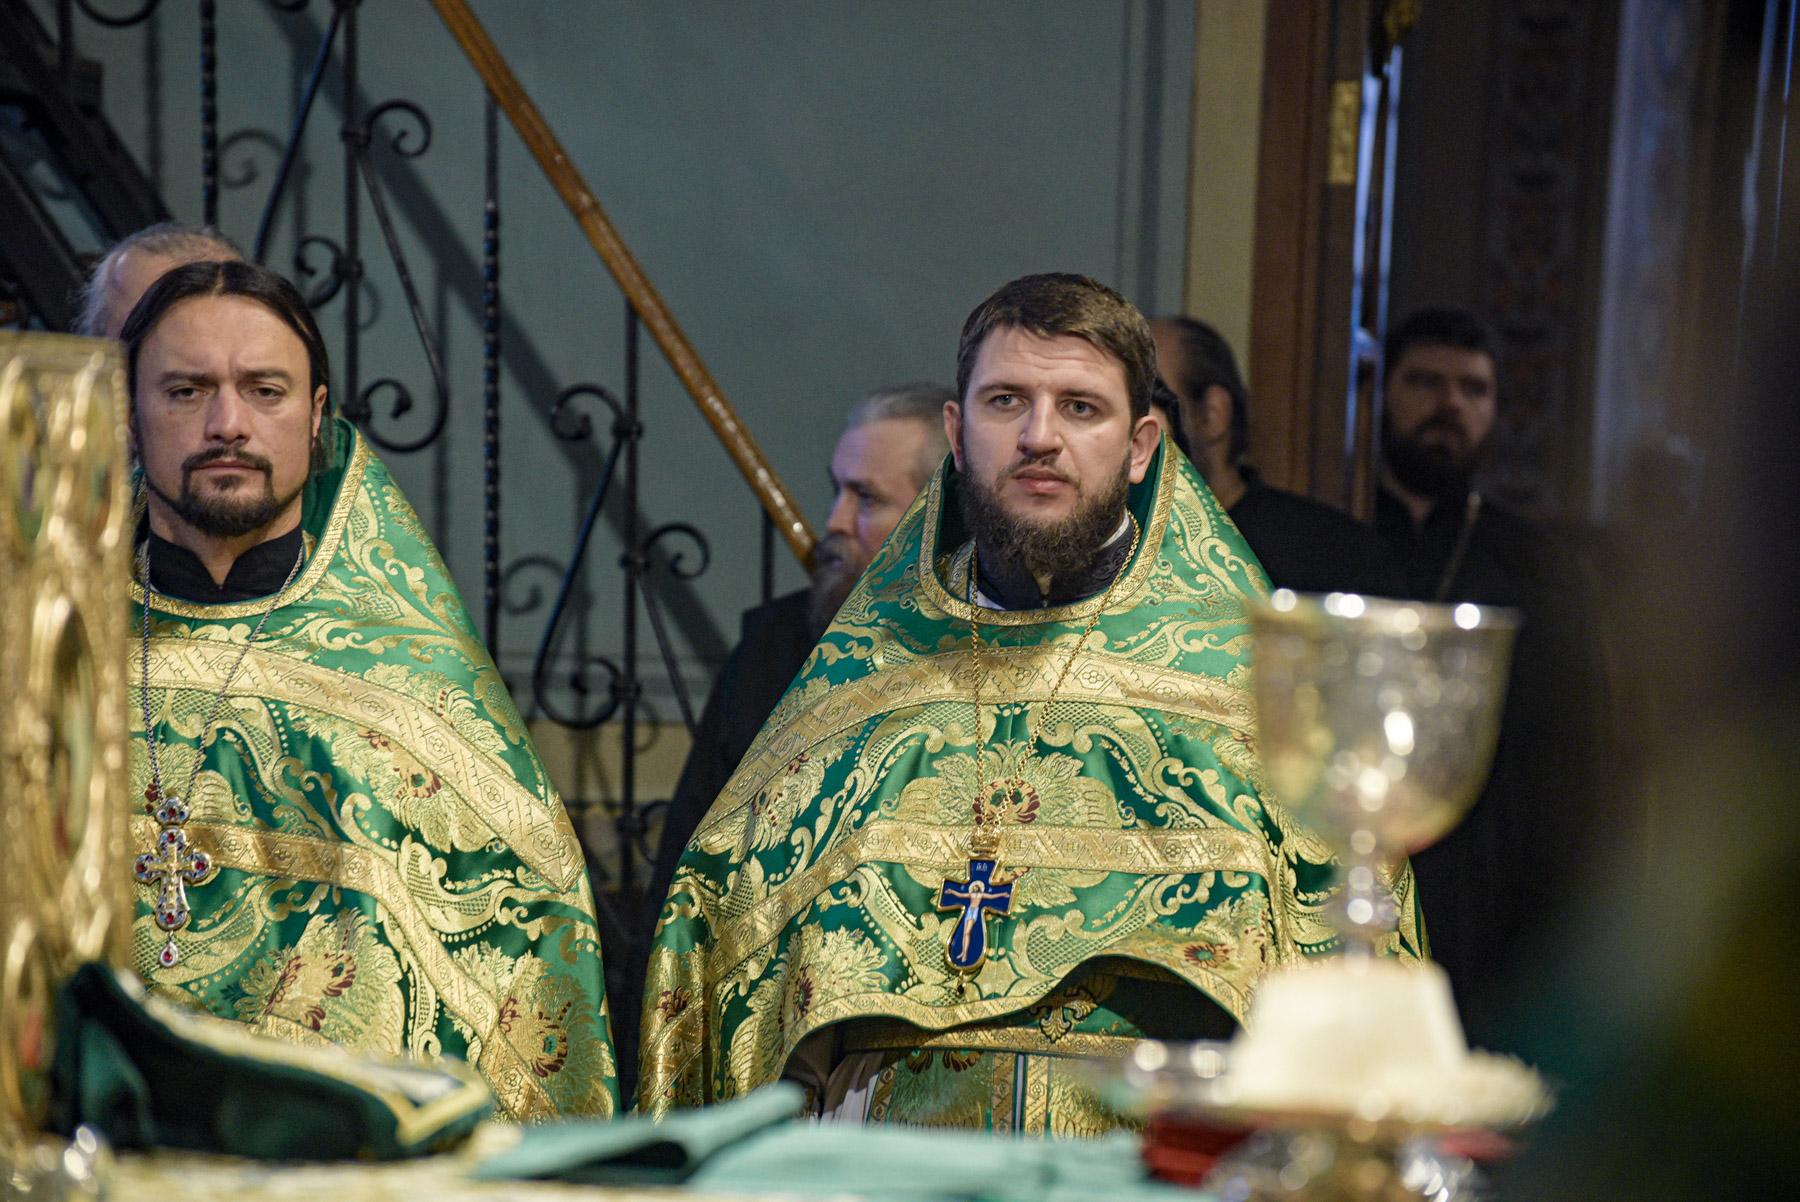 photos of orthodox christmas 0202 2